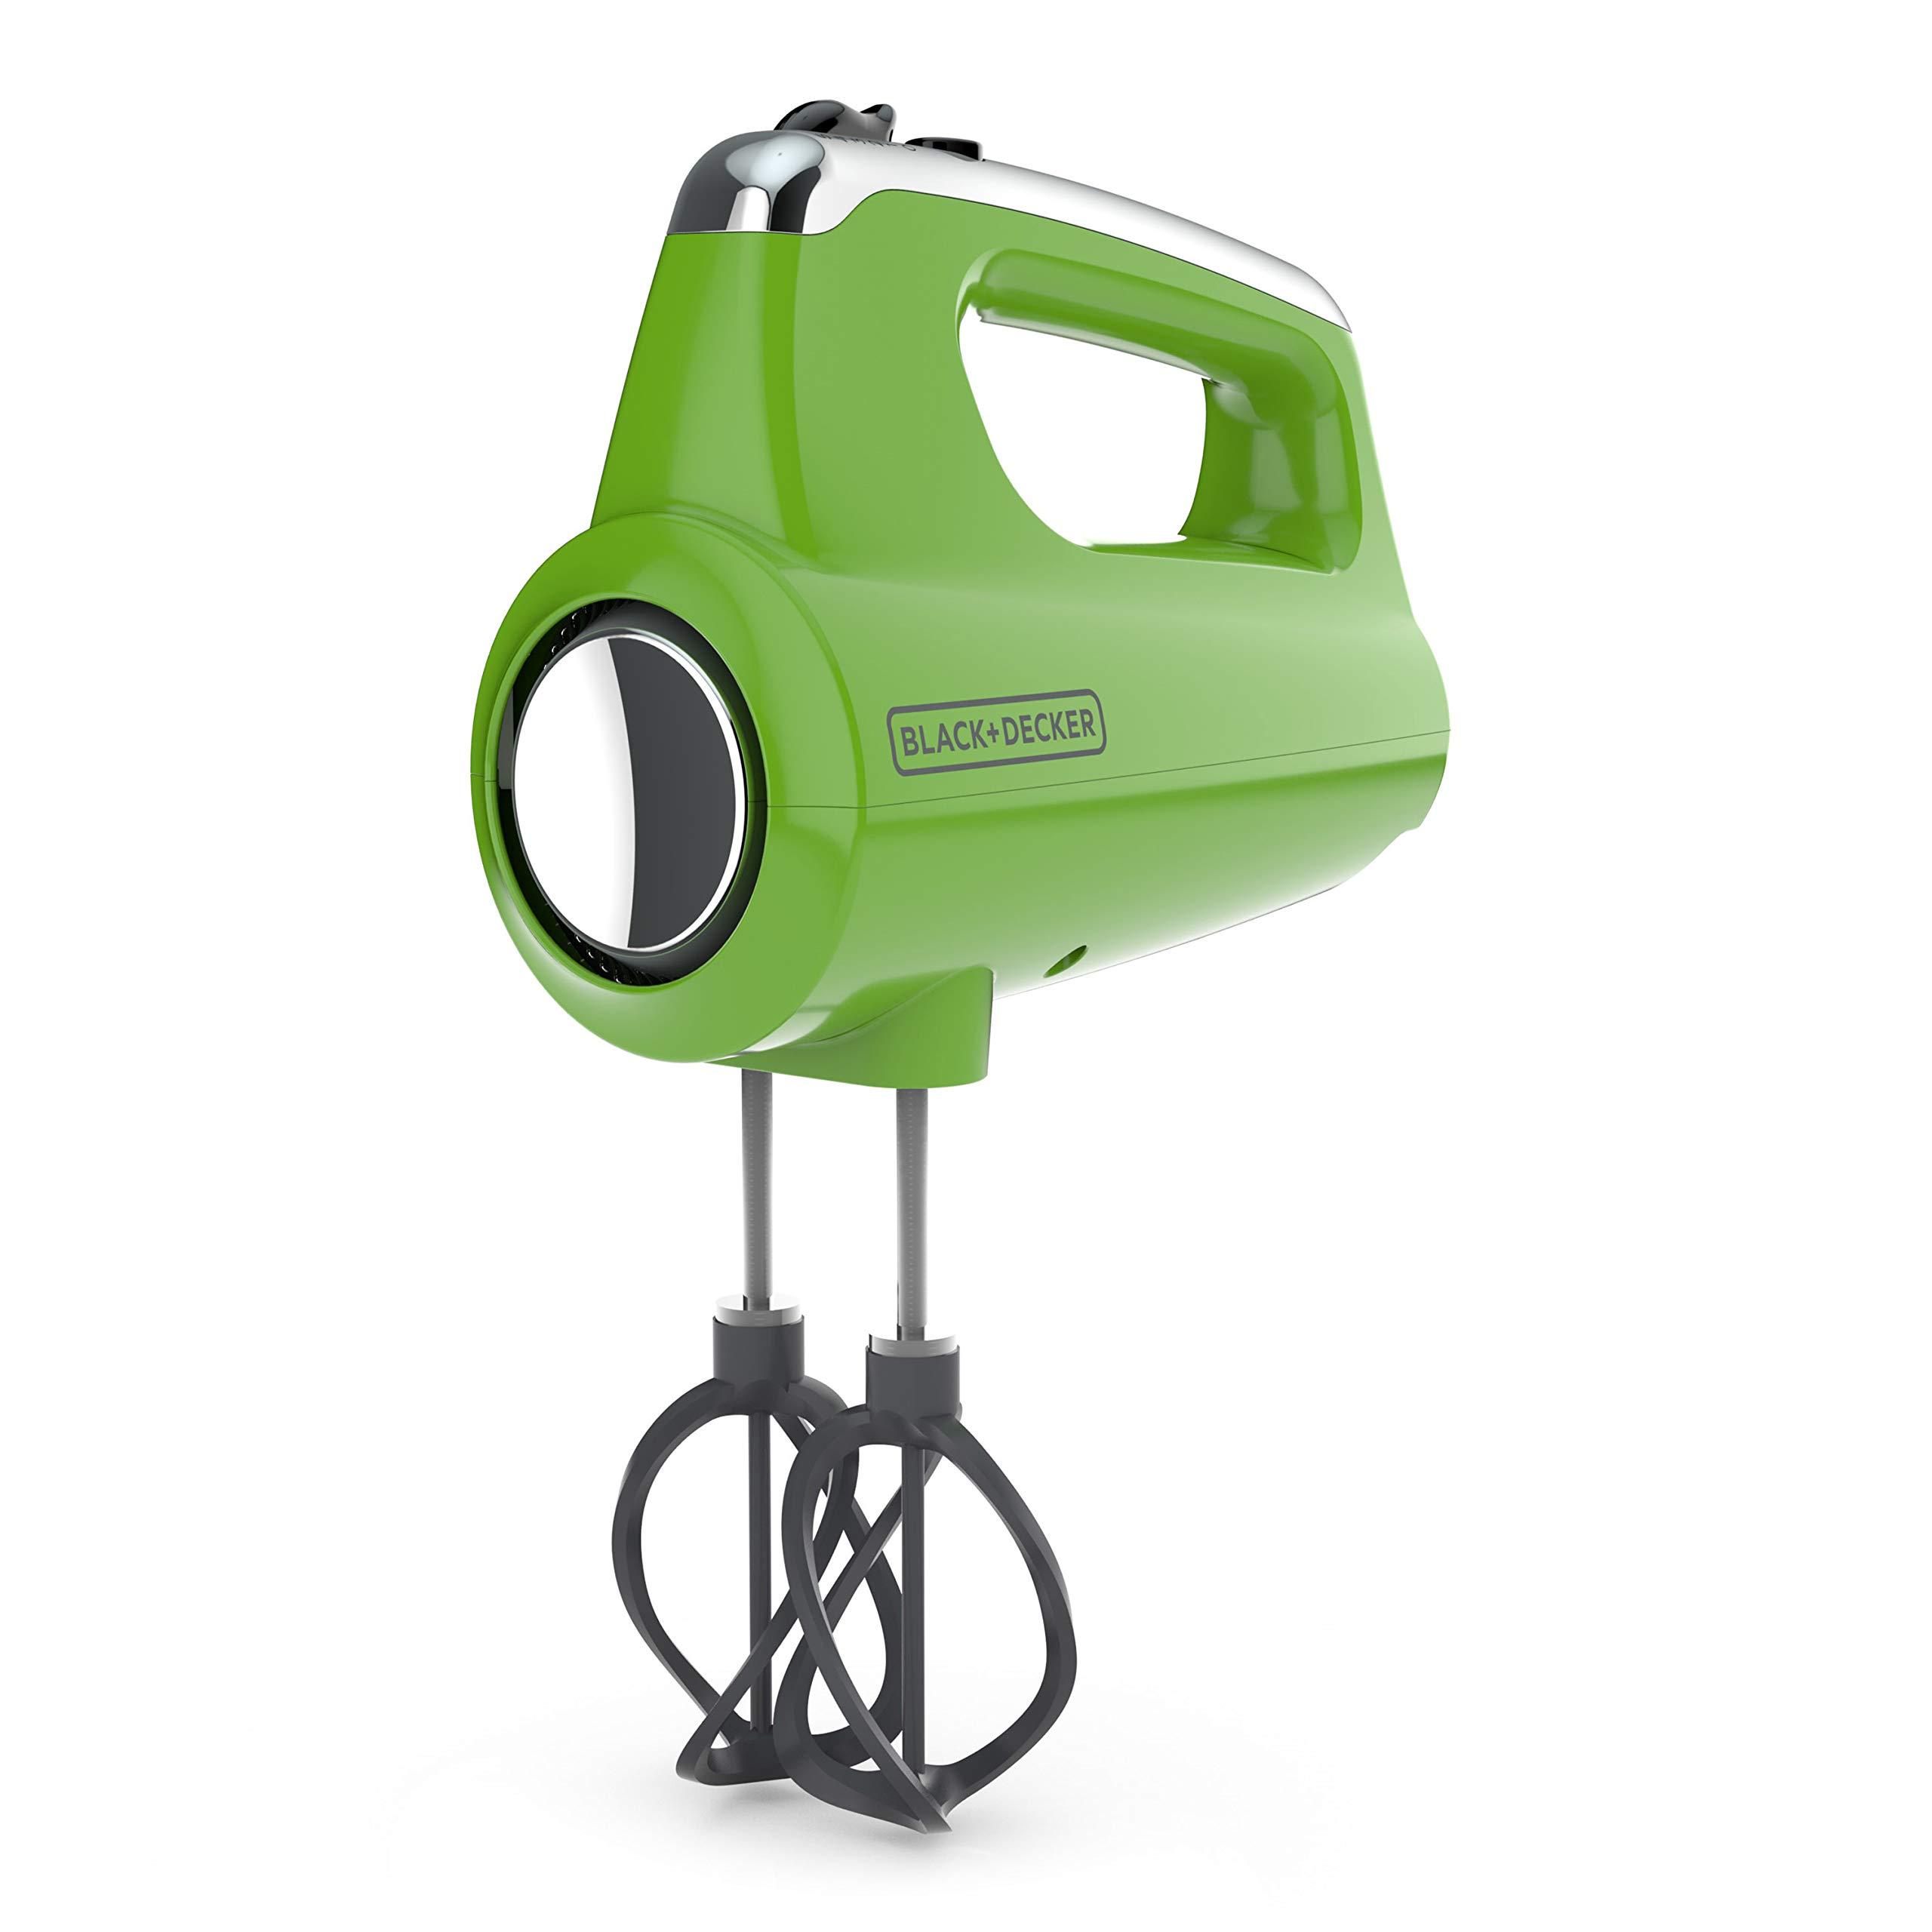 BLACK+DECKER MX600L Helix Performance Premium 5-Speed Hand Mixer, 5 Attachments + Case, Lime Green